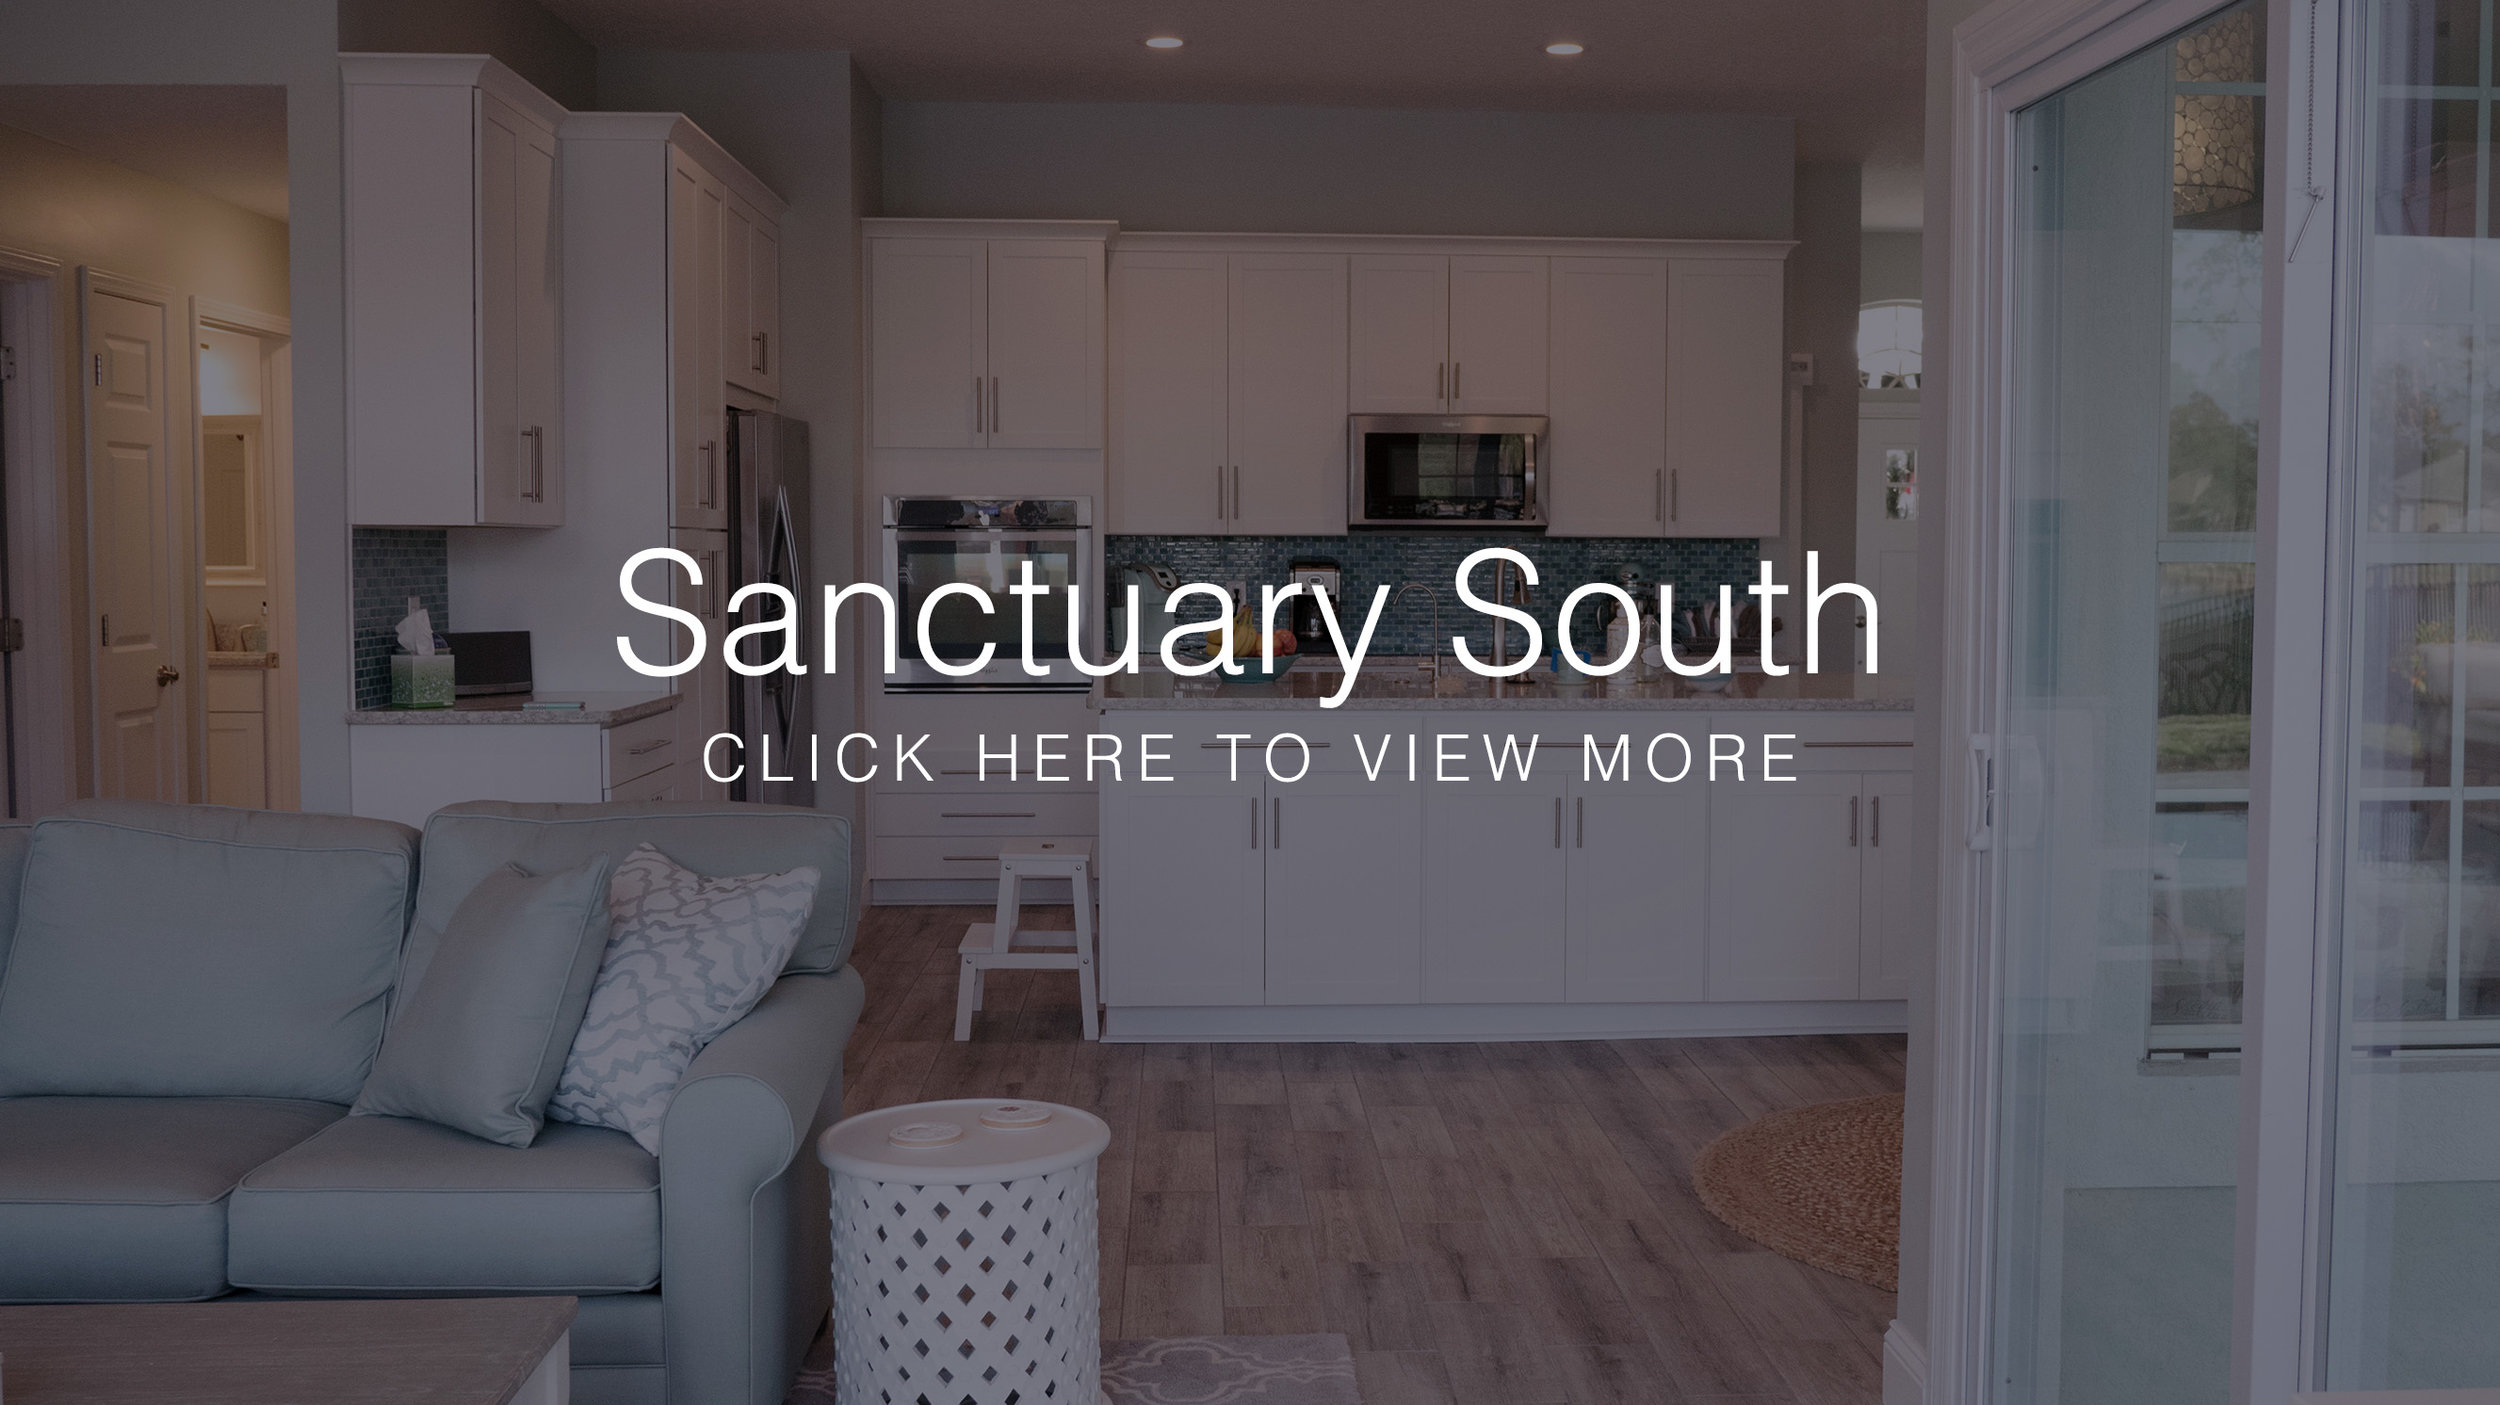 SanctuarySouth- Titles.jpg